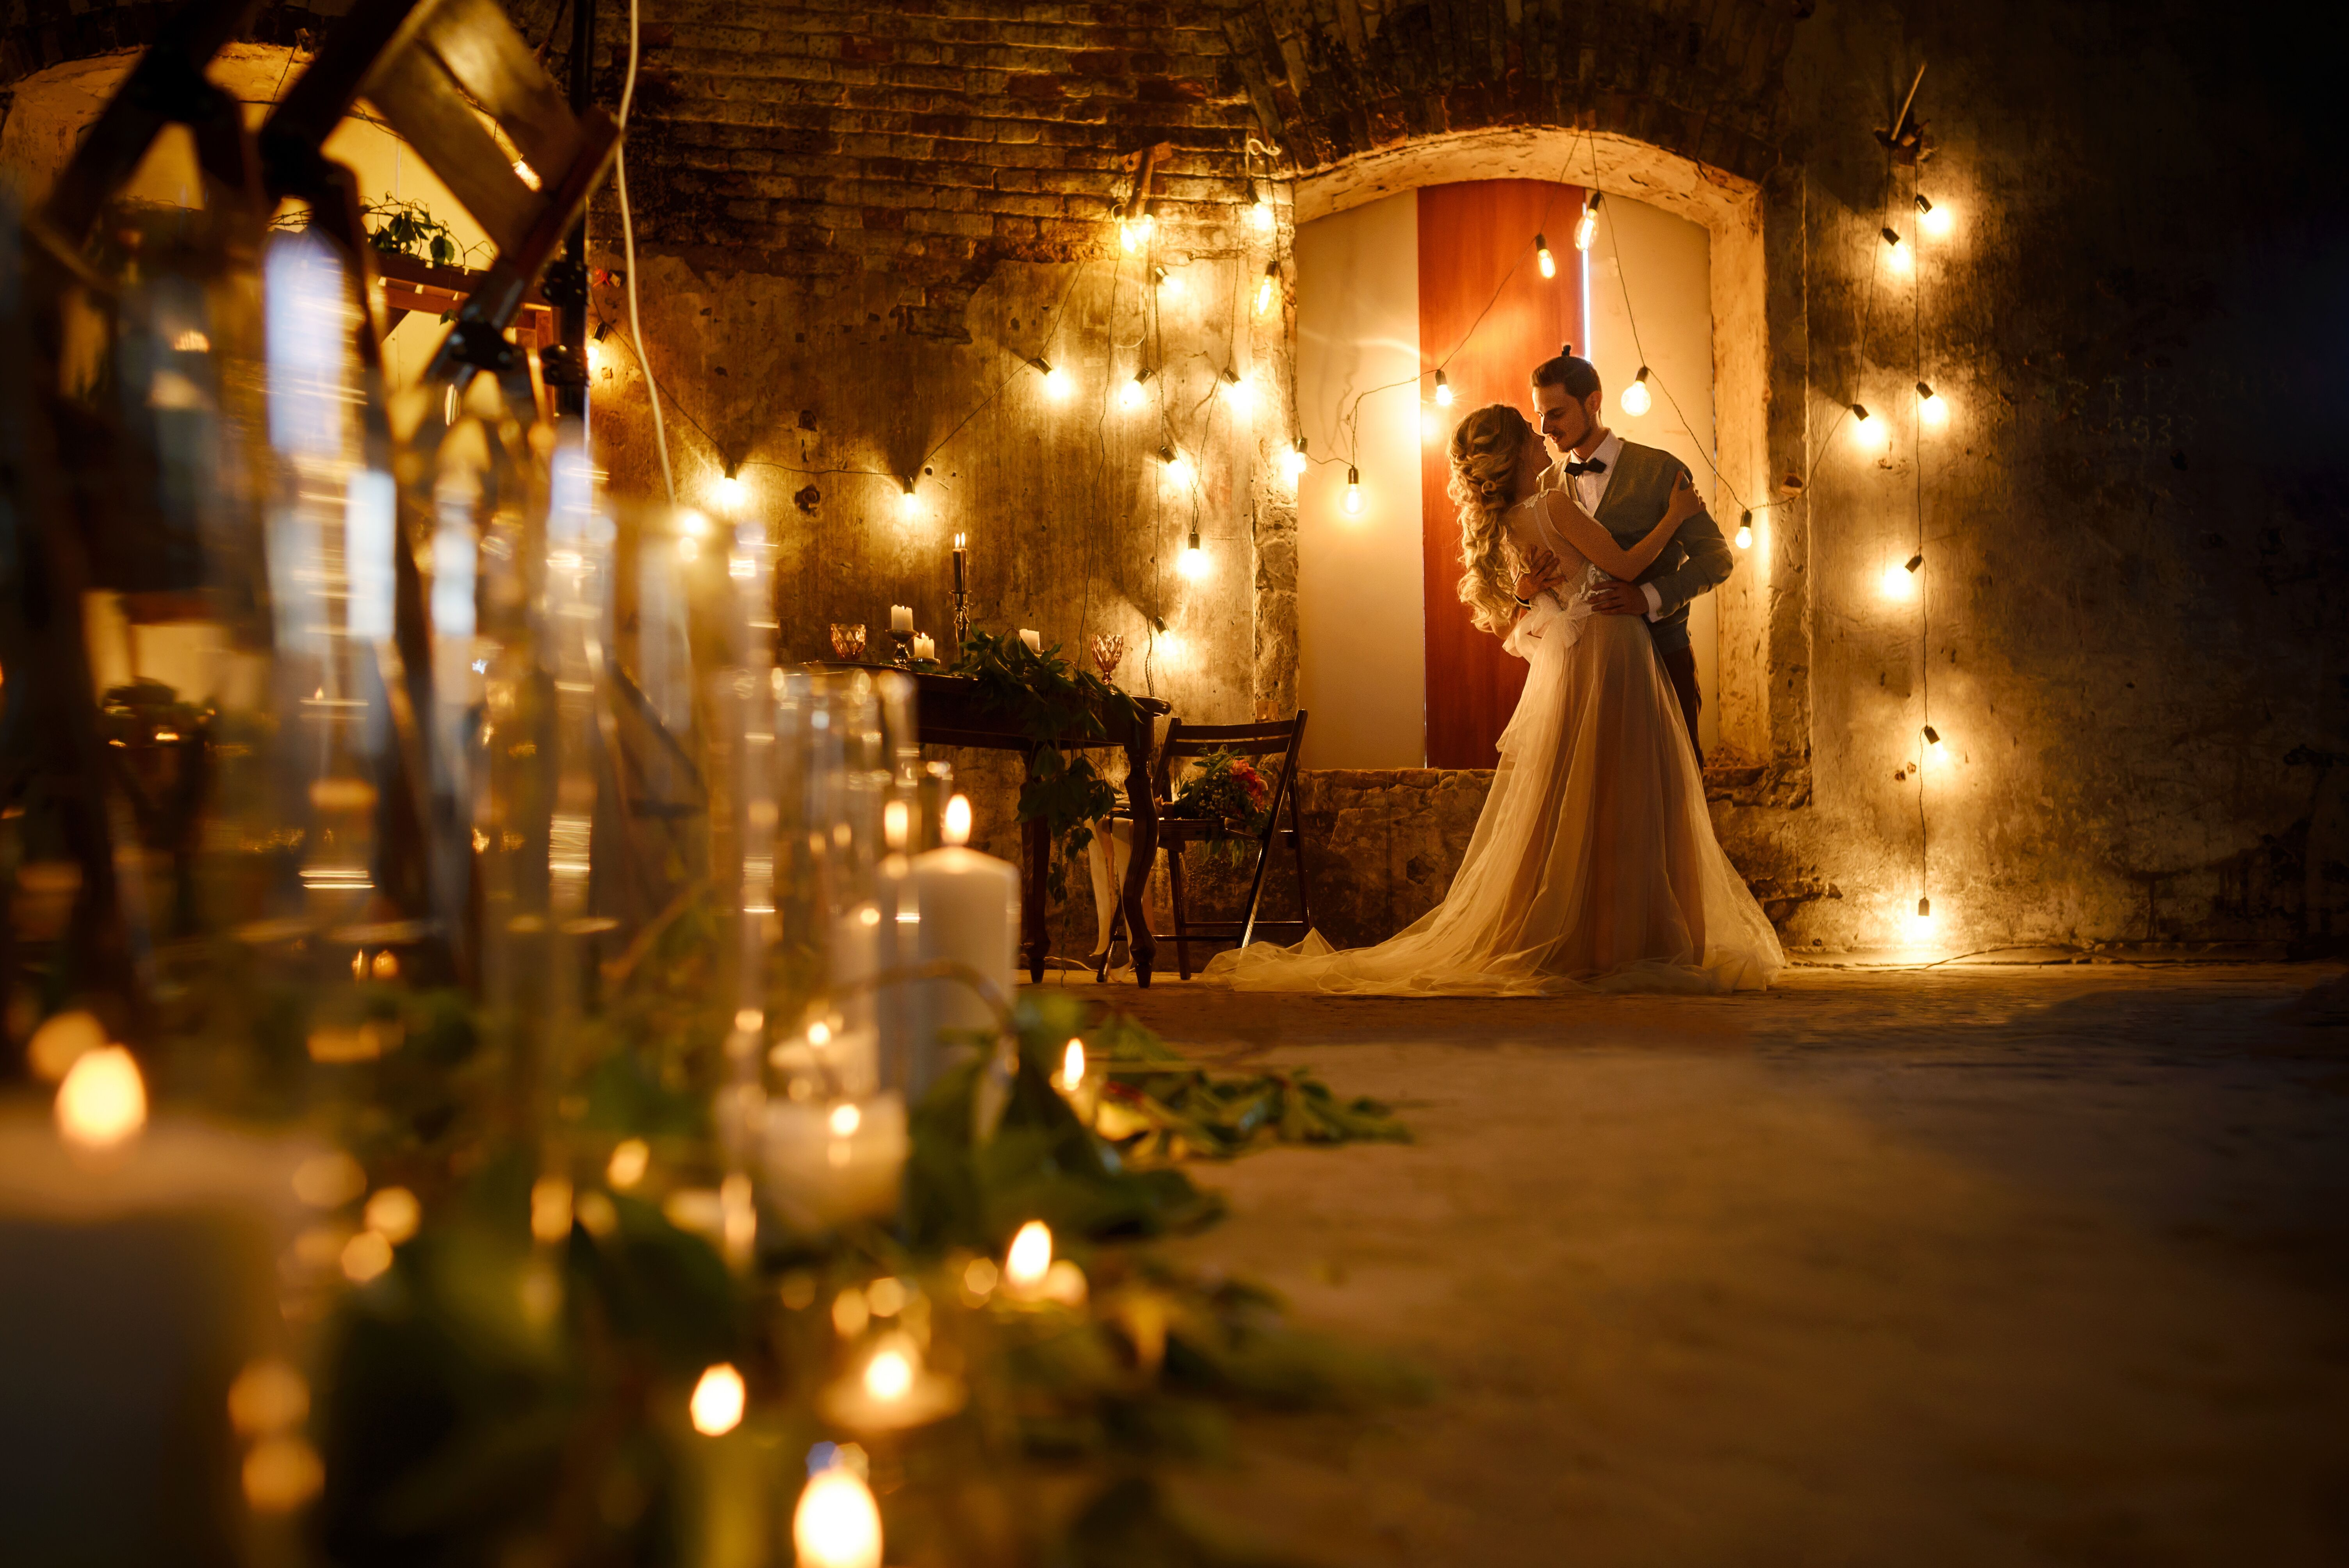 Wedding reception venues in belleville nj the knot the art factory paterson nj arubaitofo Images